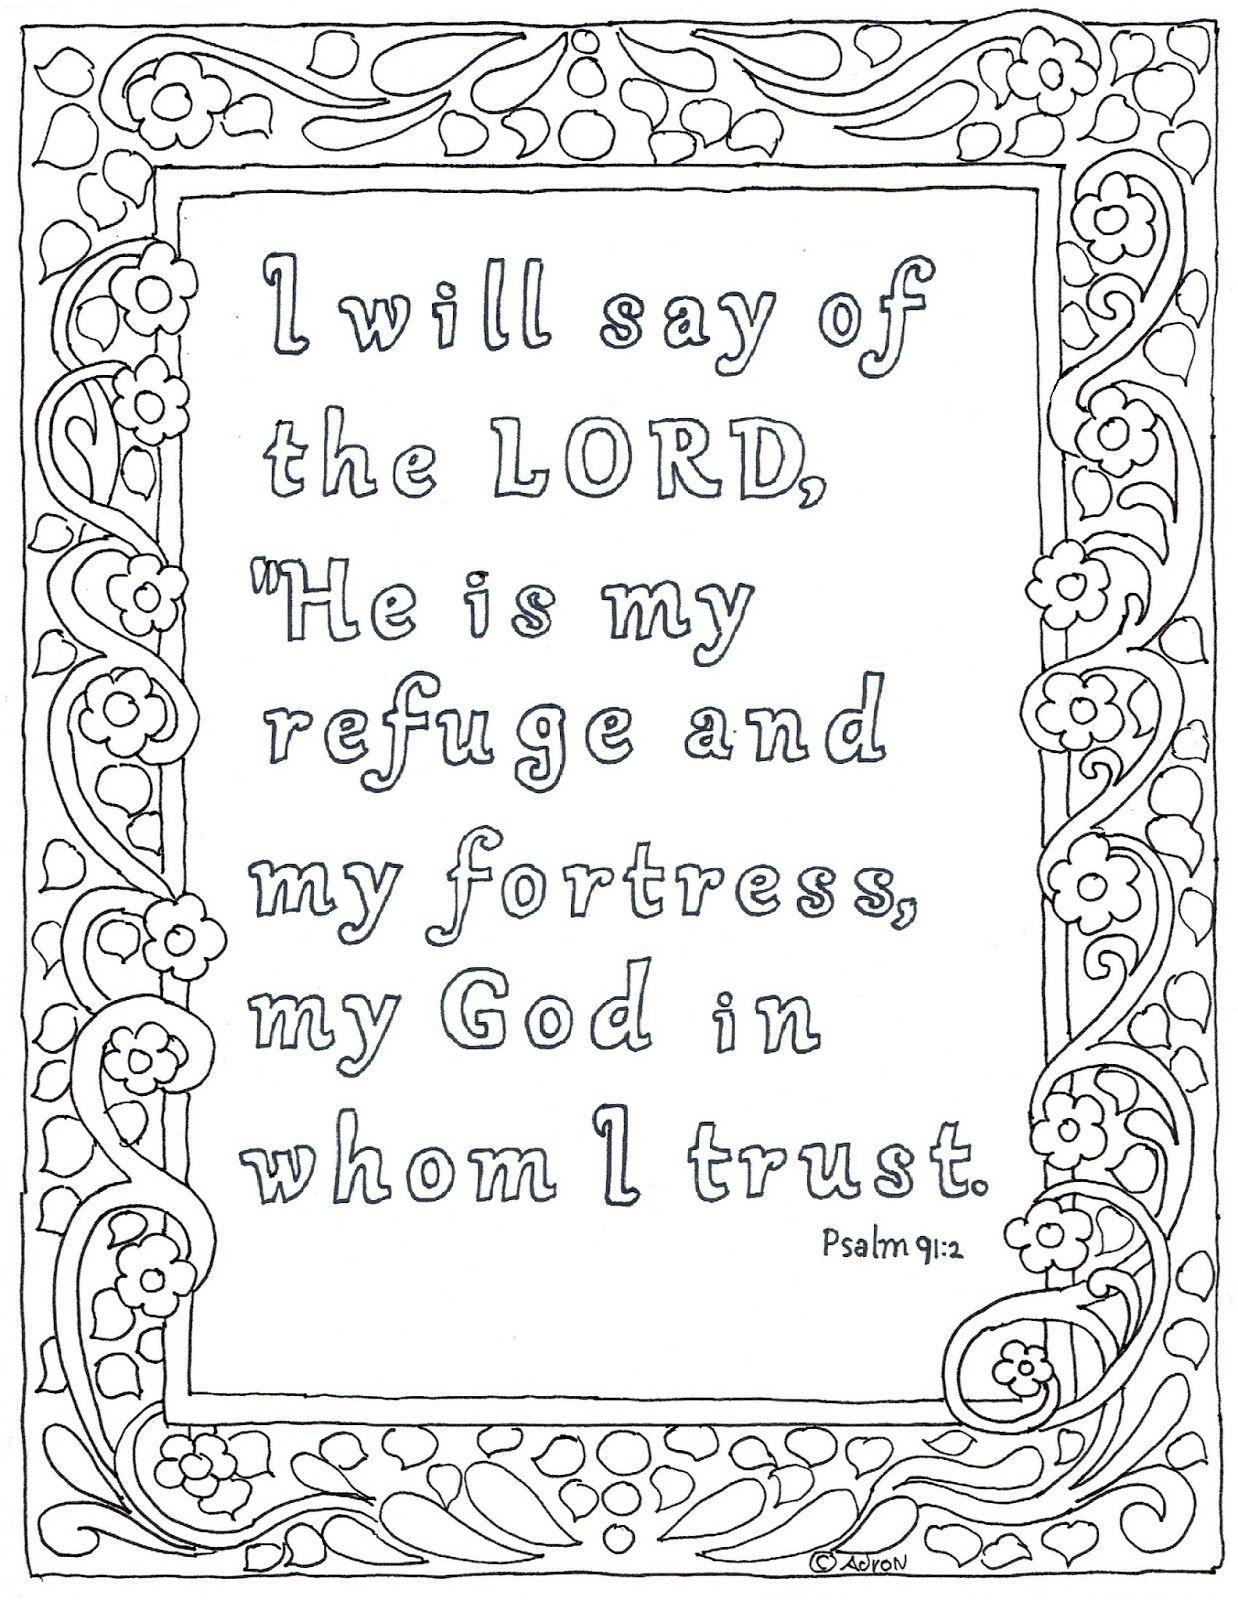 Psalm 91 2 Jpg 1238 1600 Bible Verse Coloring Page Bible